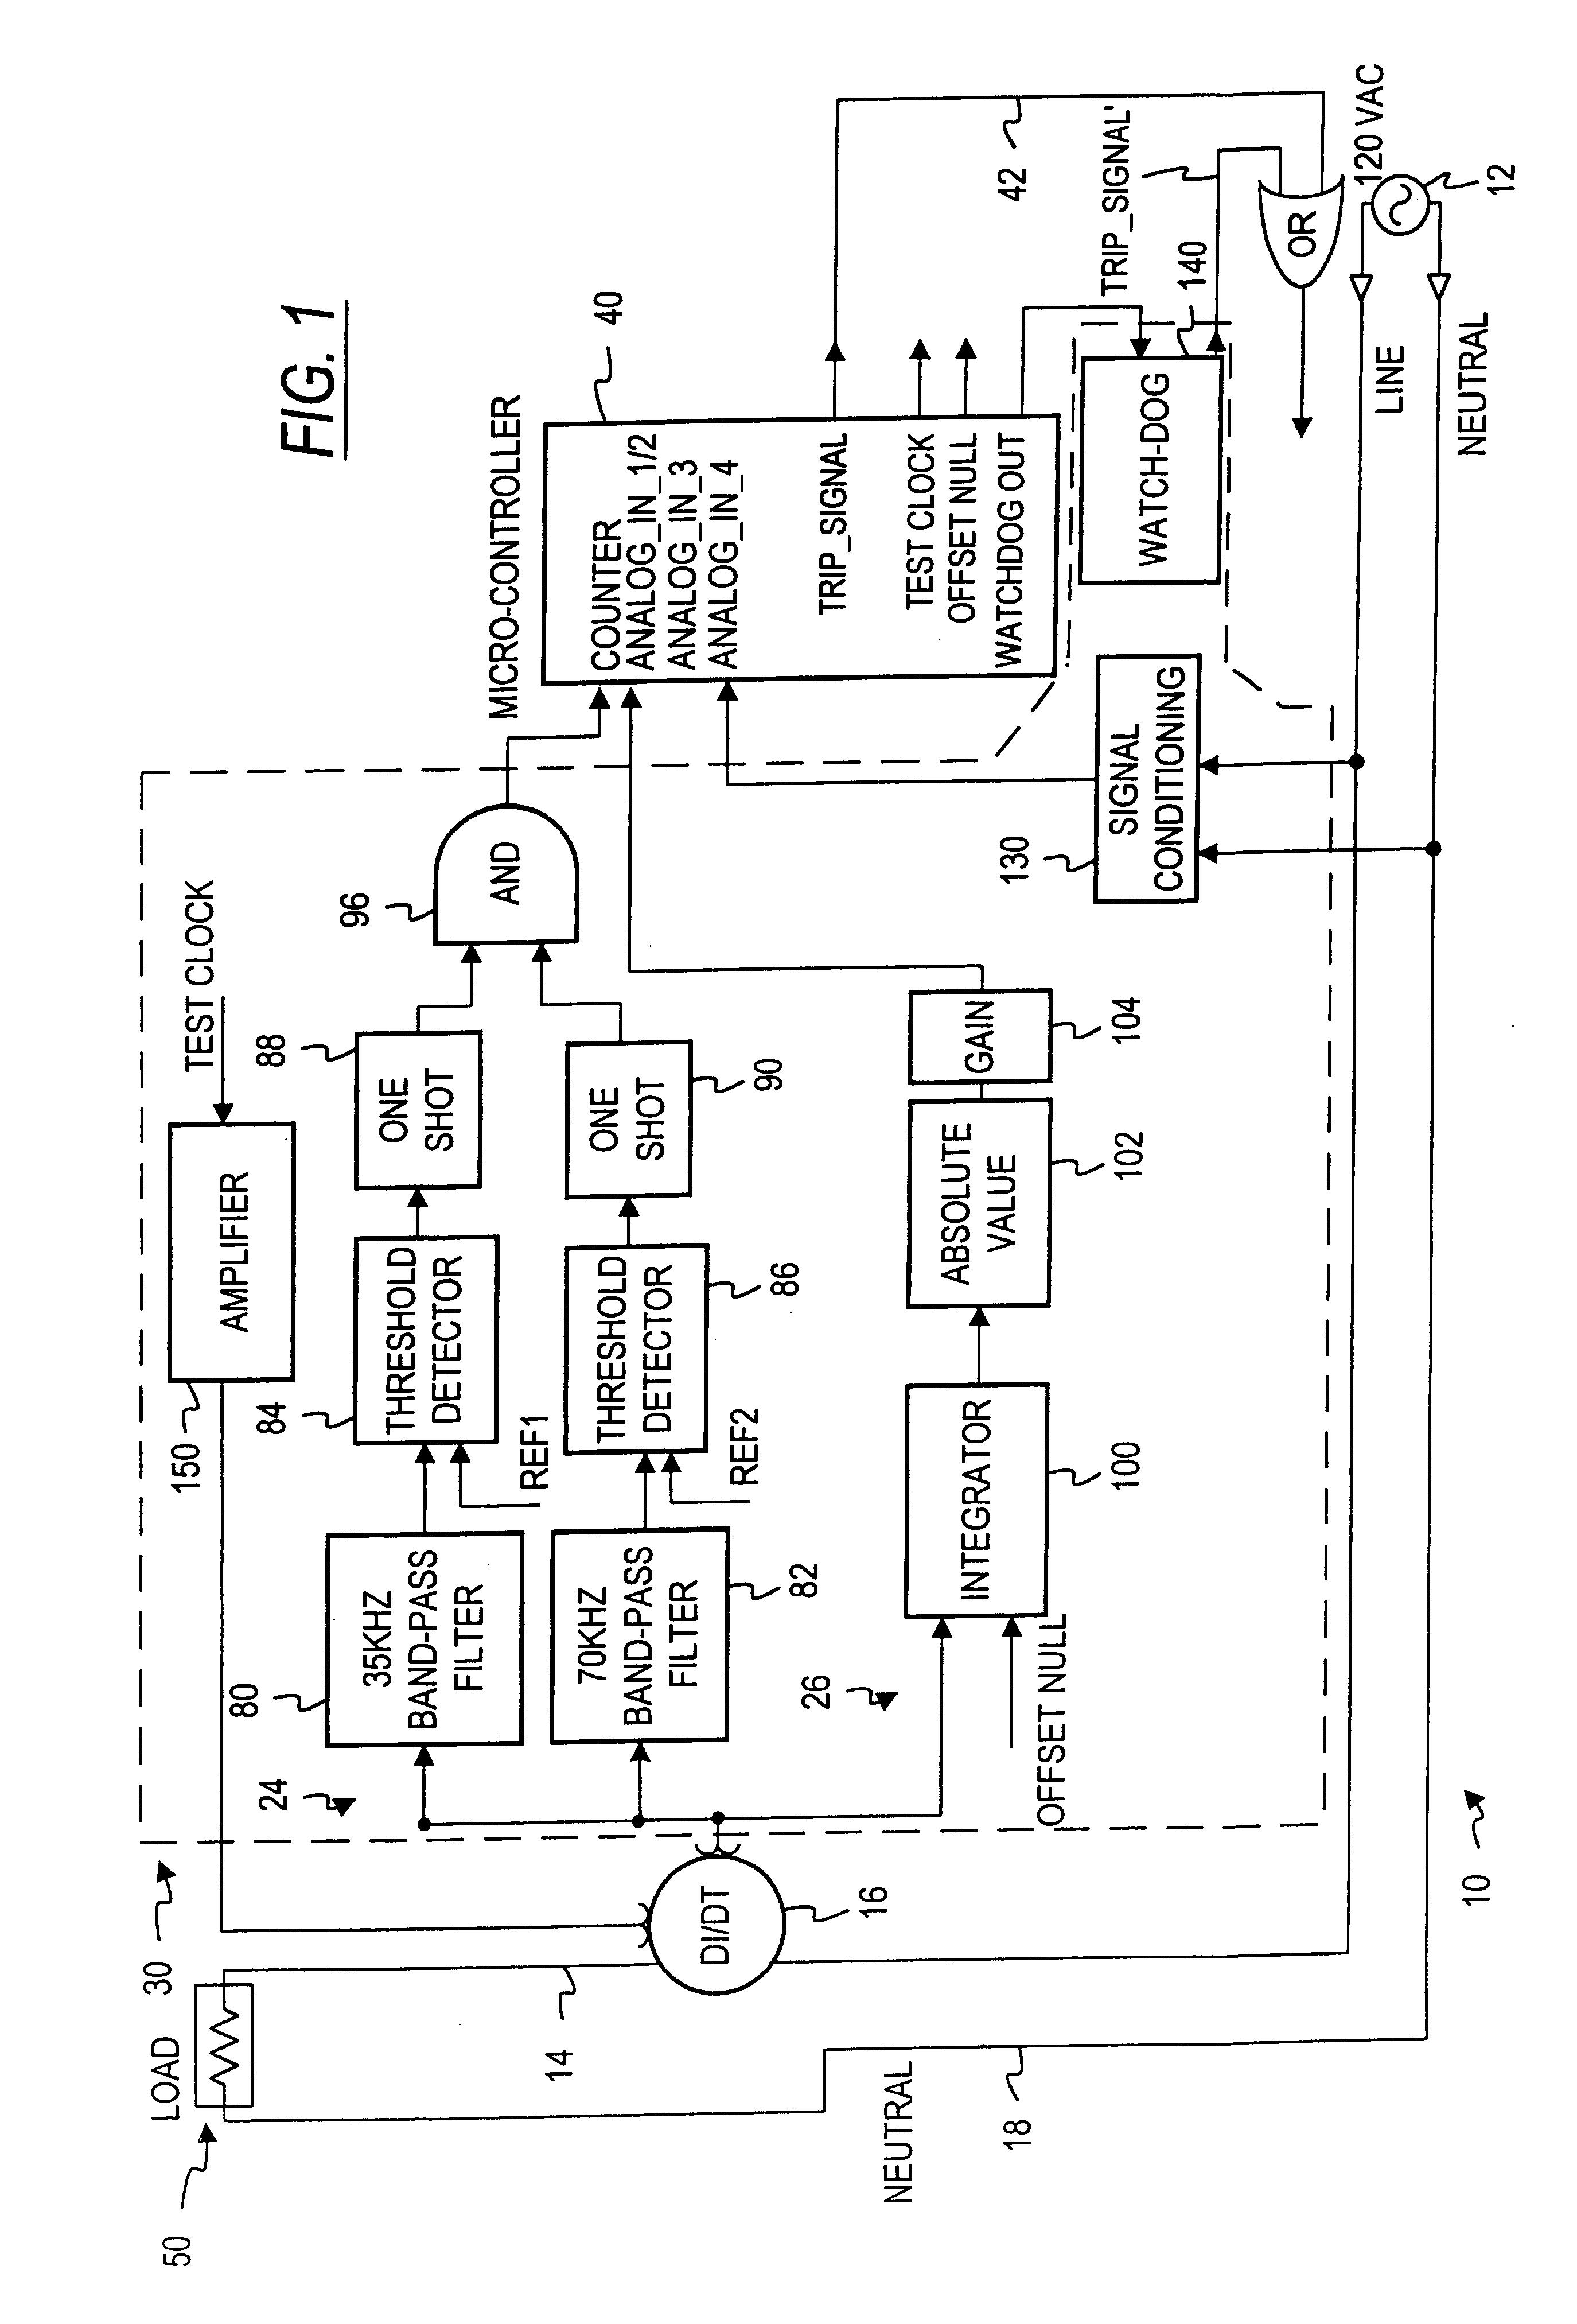 patent us6414829 - arc fault circuit interrupter